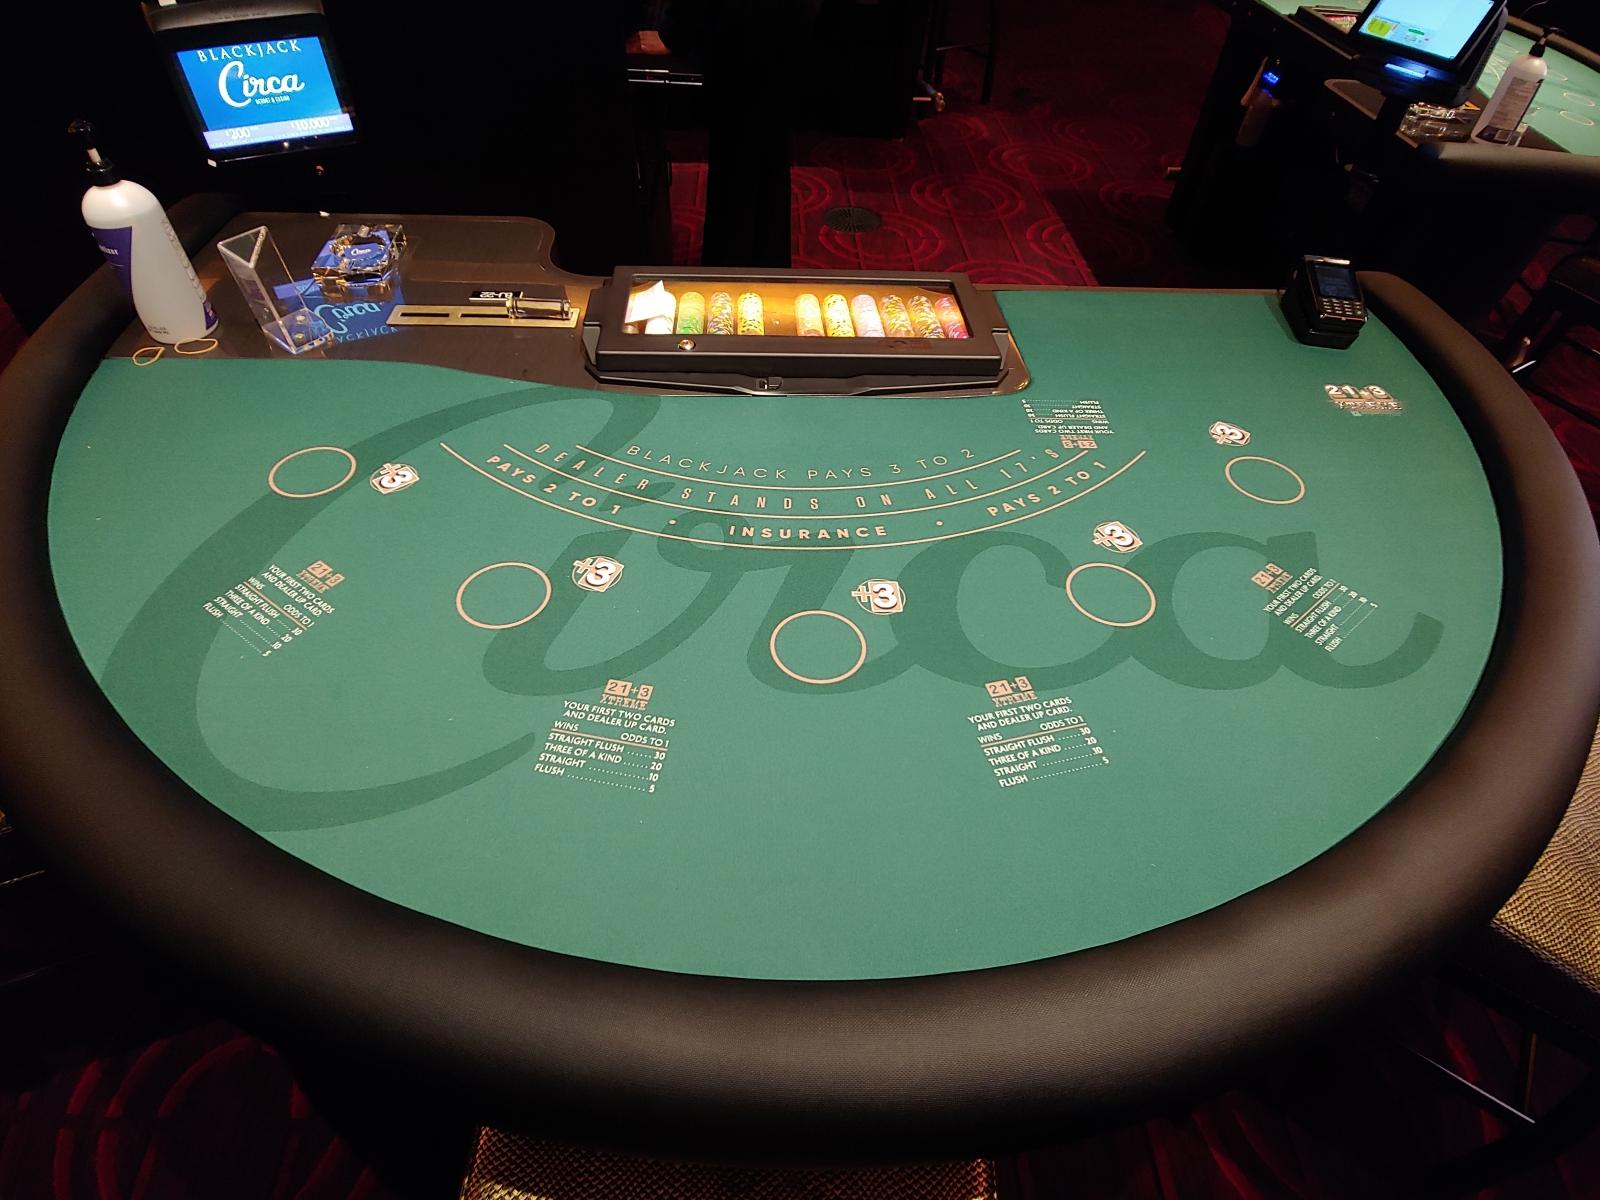 Blackjack-Stand-on-17-table-20201028_01